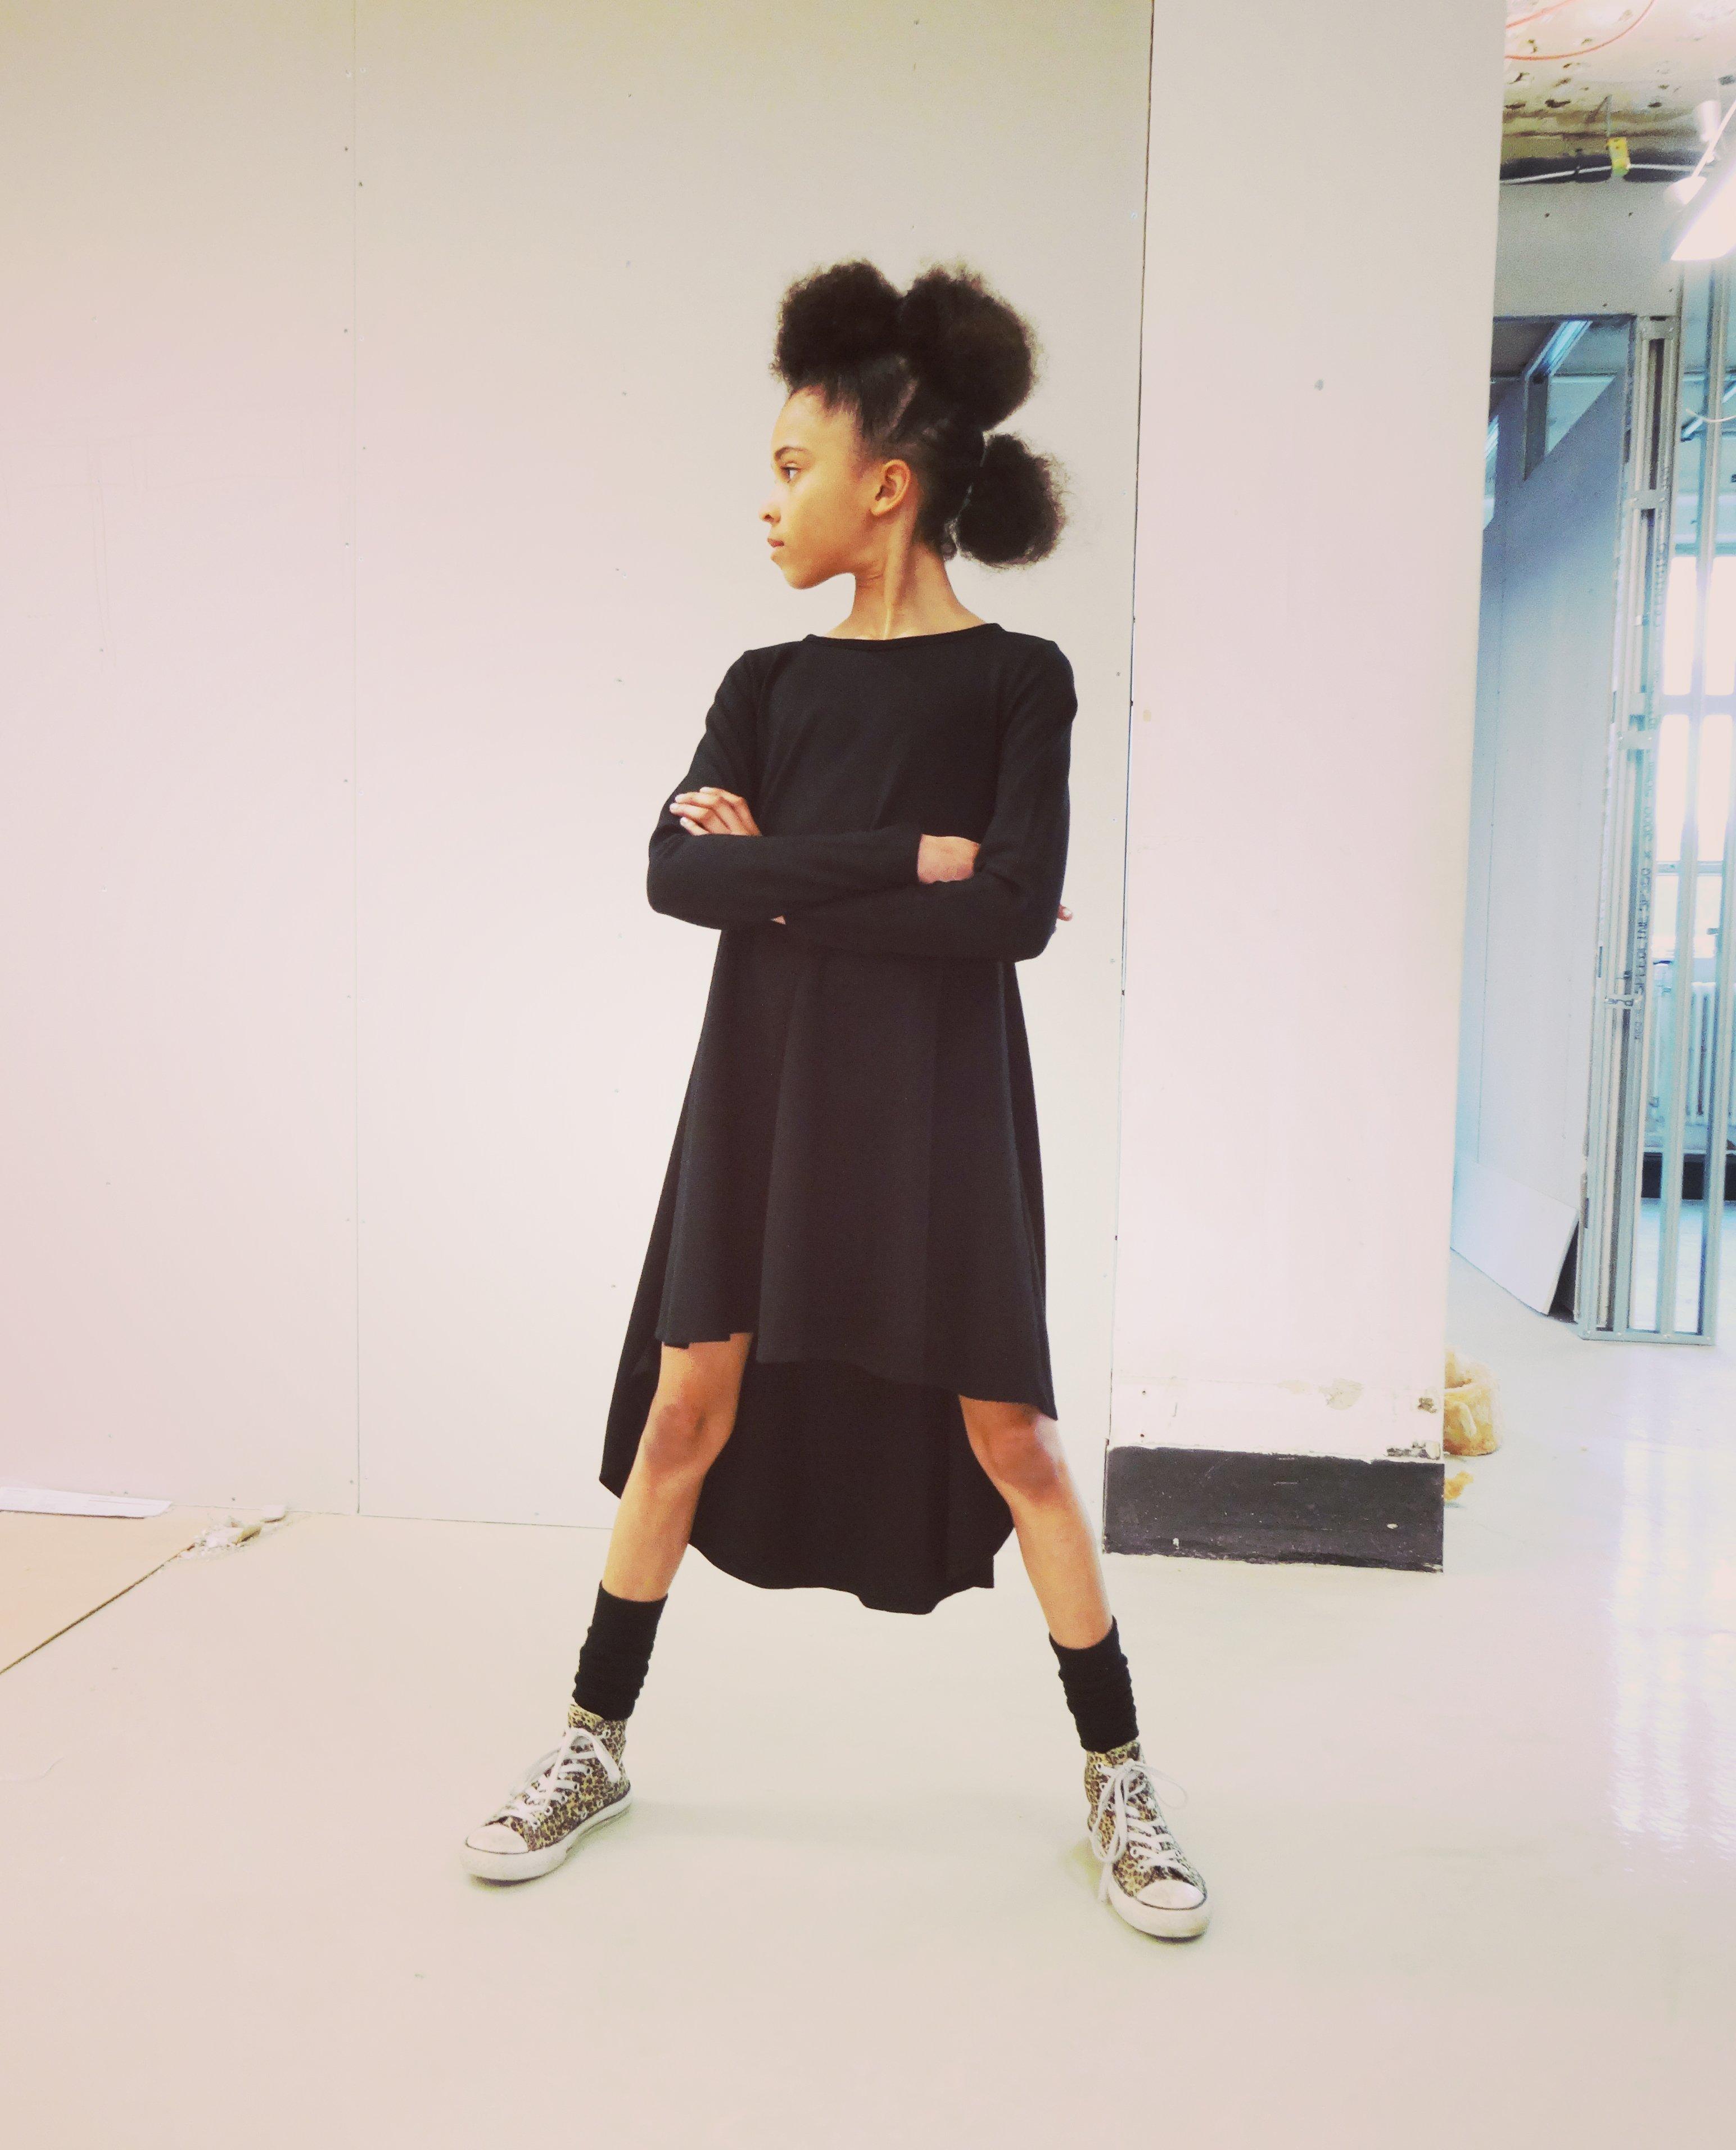 Darcy_groove dress_black_Mayfair1